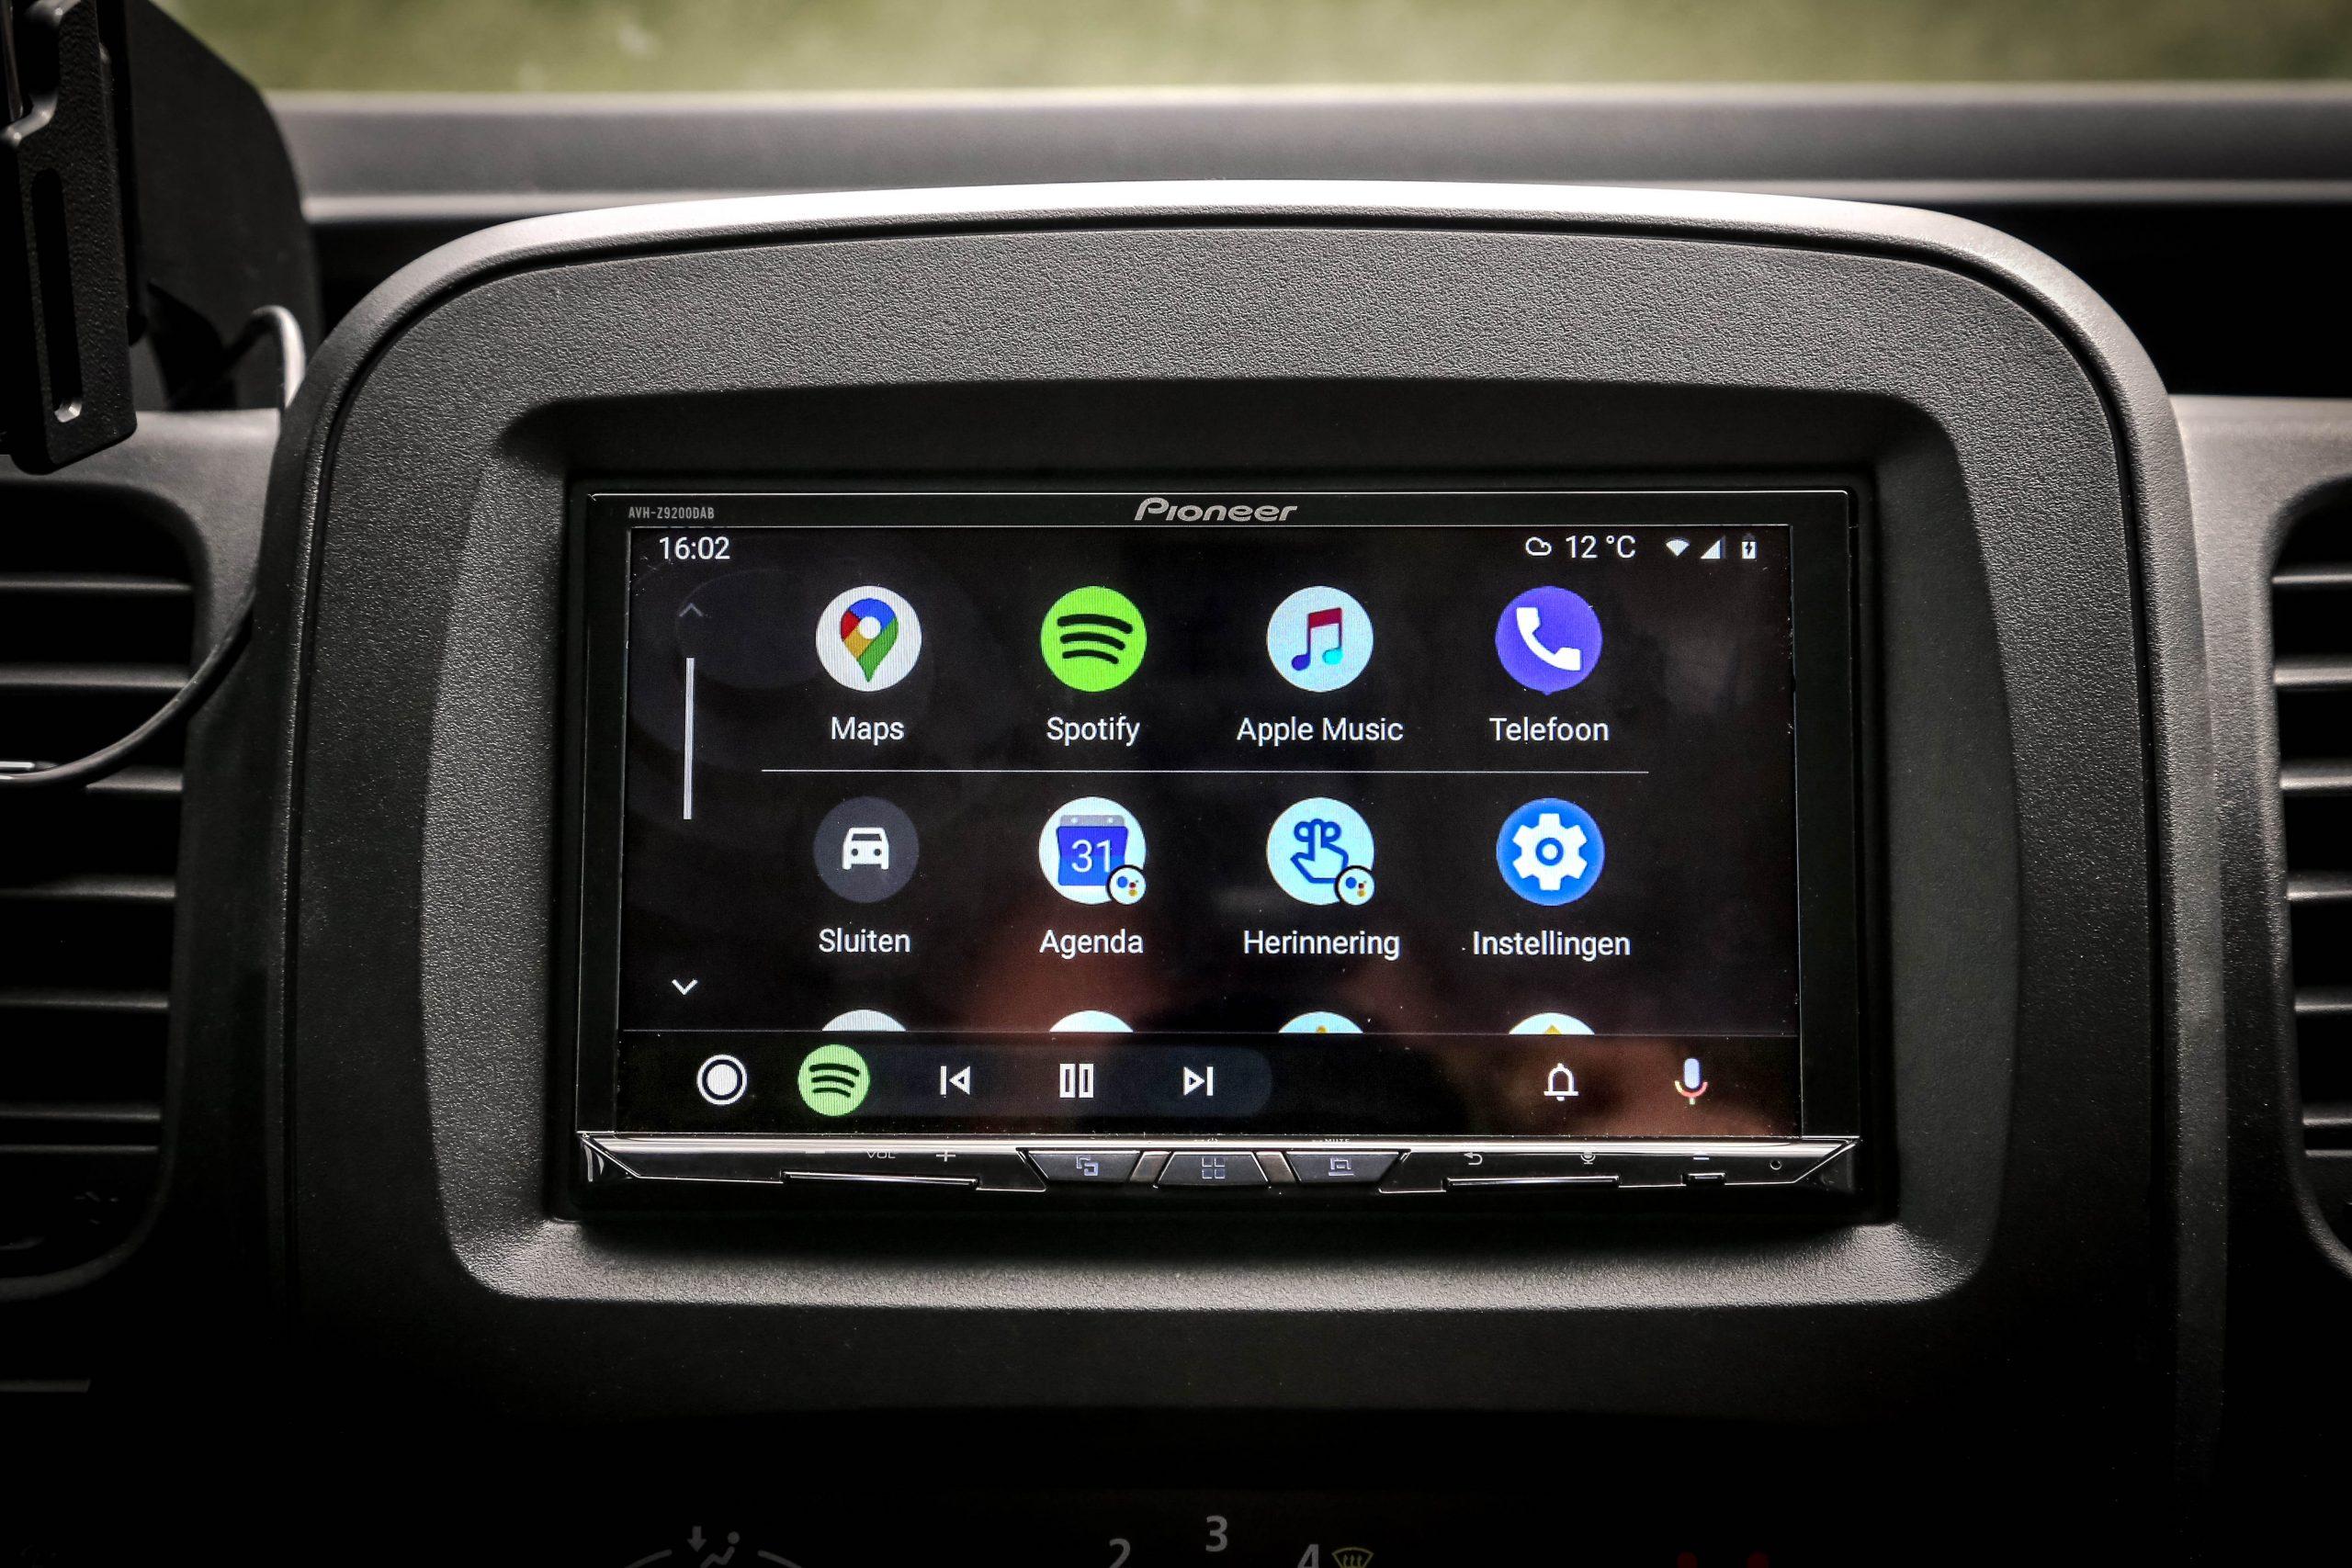 Auto Android gebruiken in de auto